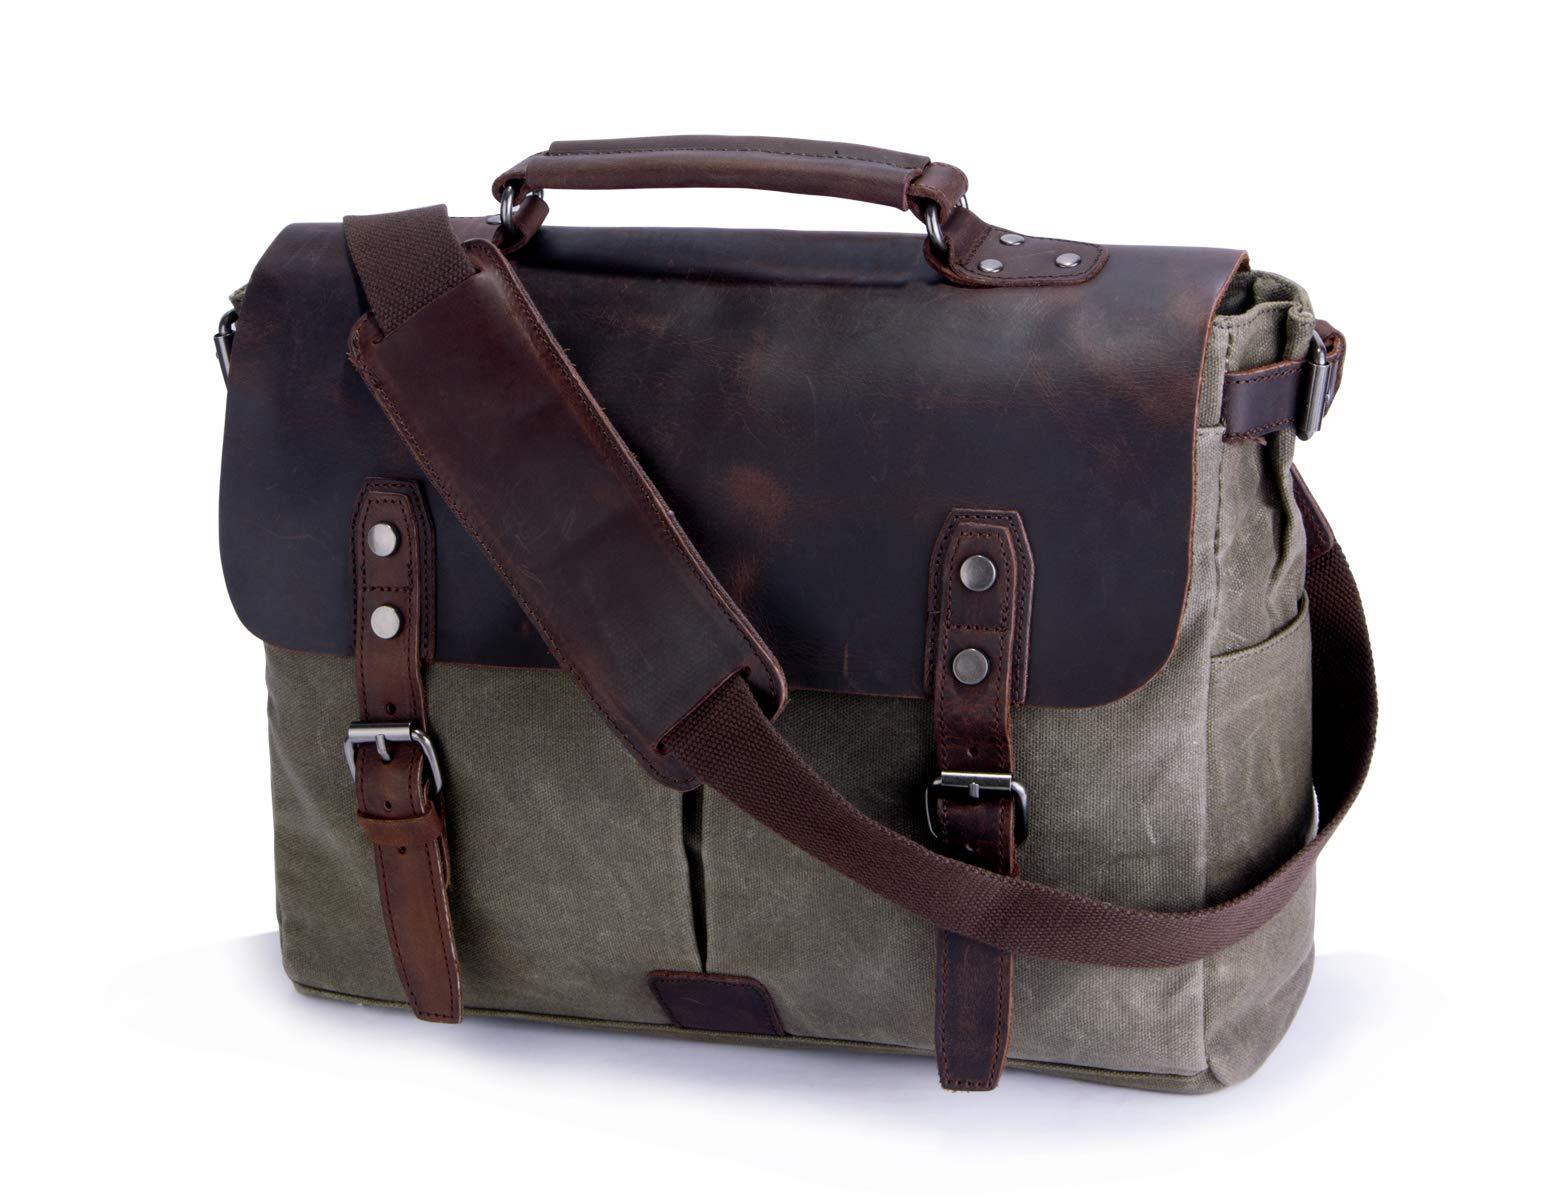 Mens Messenger Bag,Handmade Cross Body Bag Genuine Leather Laptop Briefcase Waxed Canvas Shoulder Bag with Detachable Strap,Computer Sctchel Bag Travel Work Bag for 15.6 inches Laptop